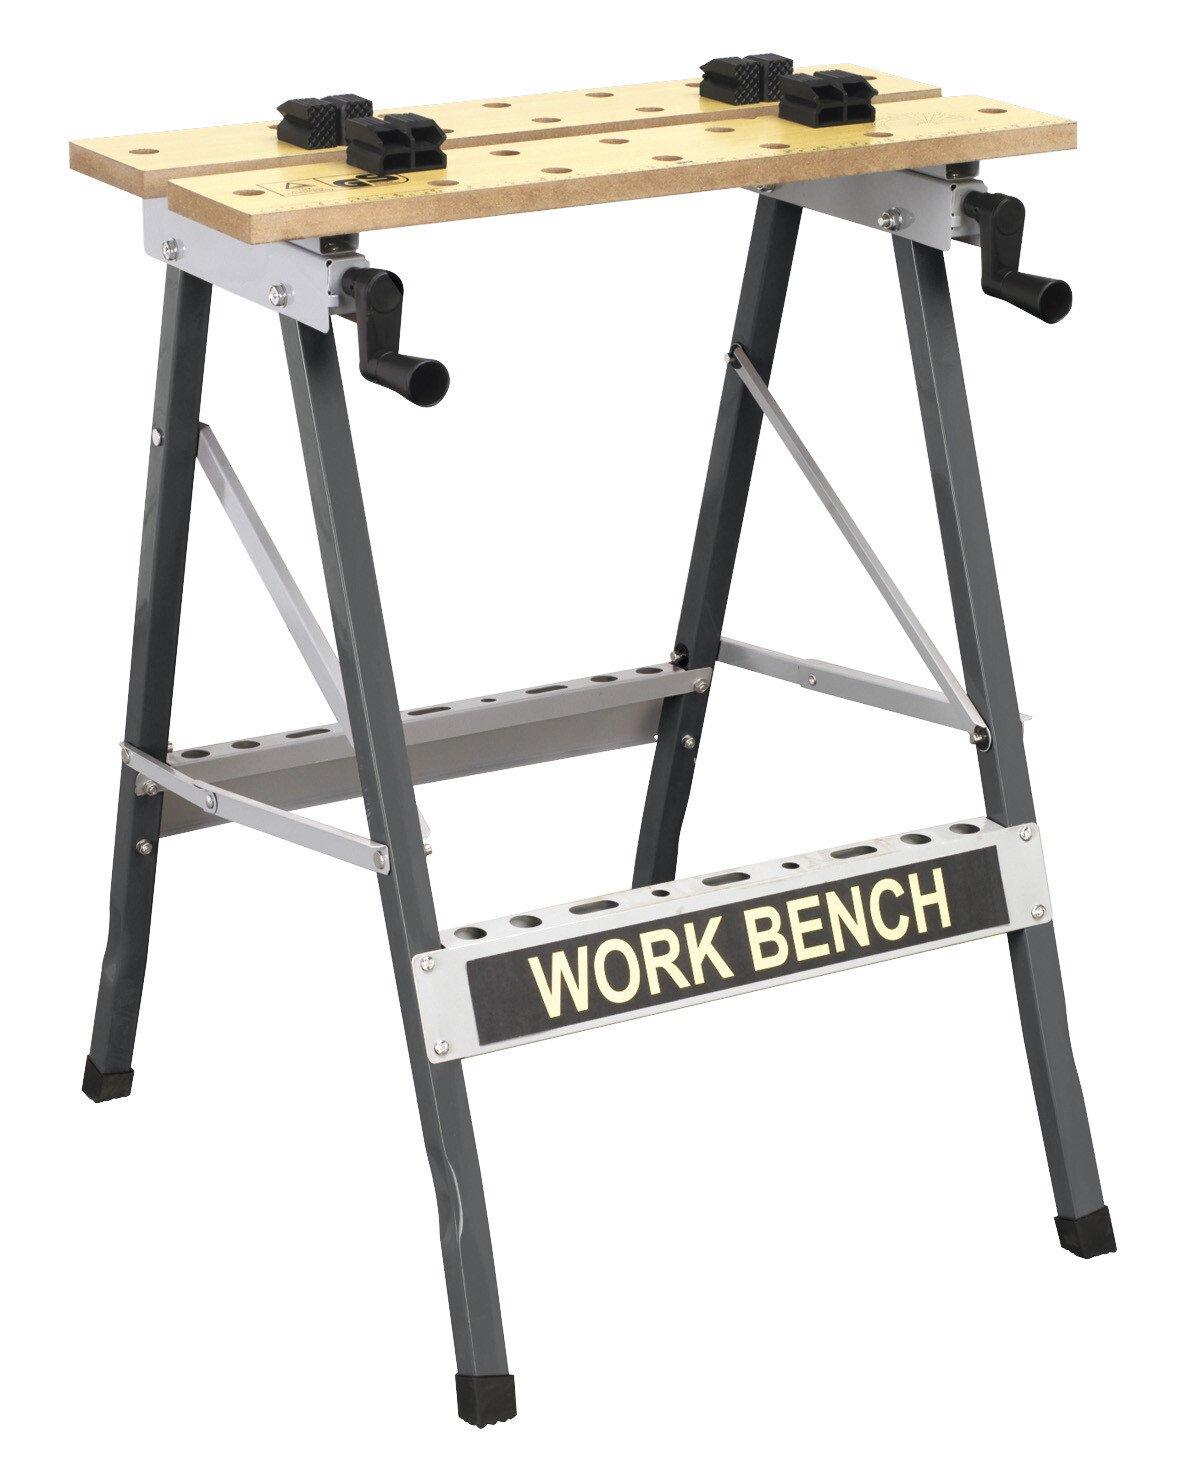 Stupendous Sealey Fwb1 Folding Workbench 290Mm Camellatalisay Diy Chair Ideas Camellatalisaycom